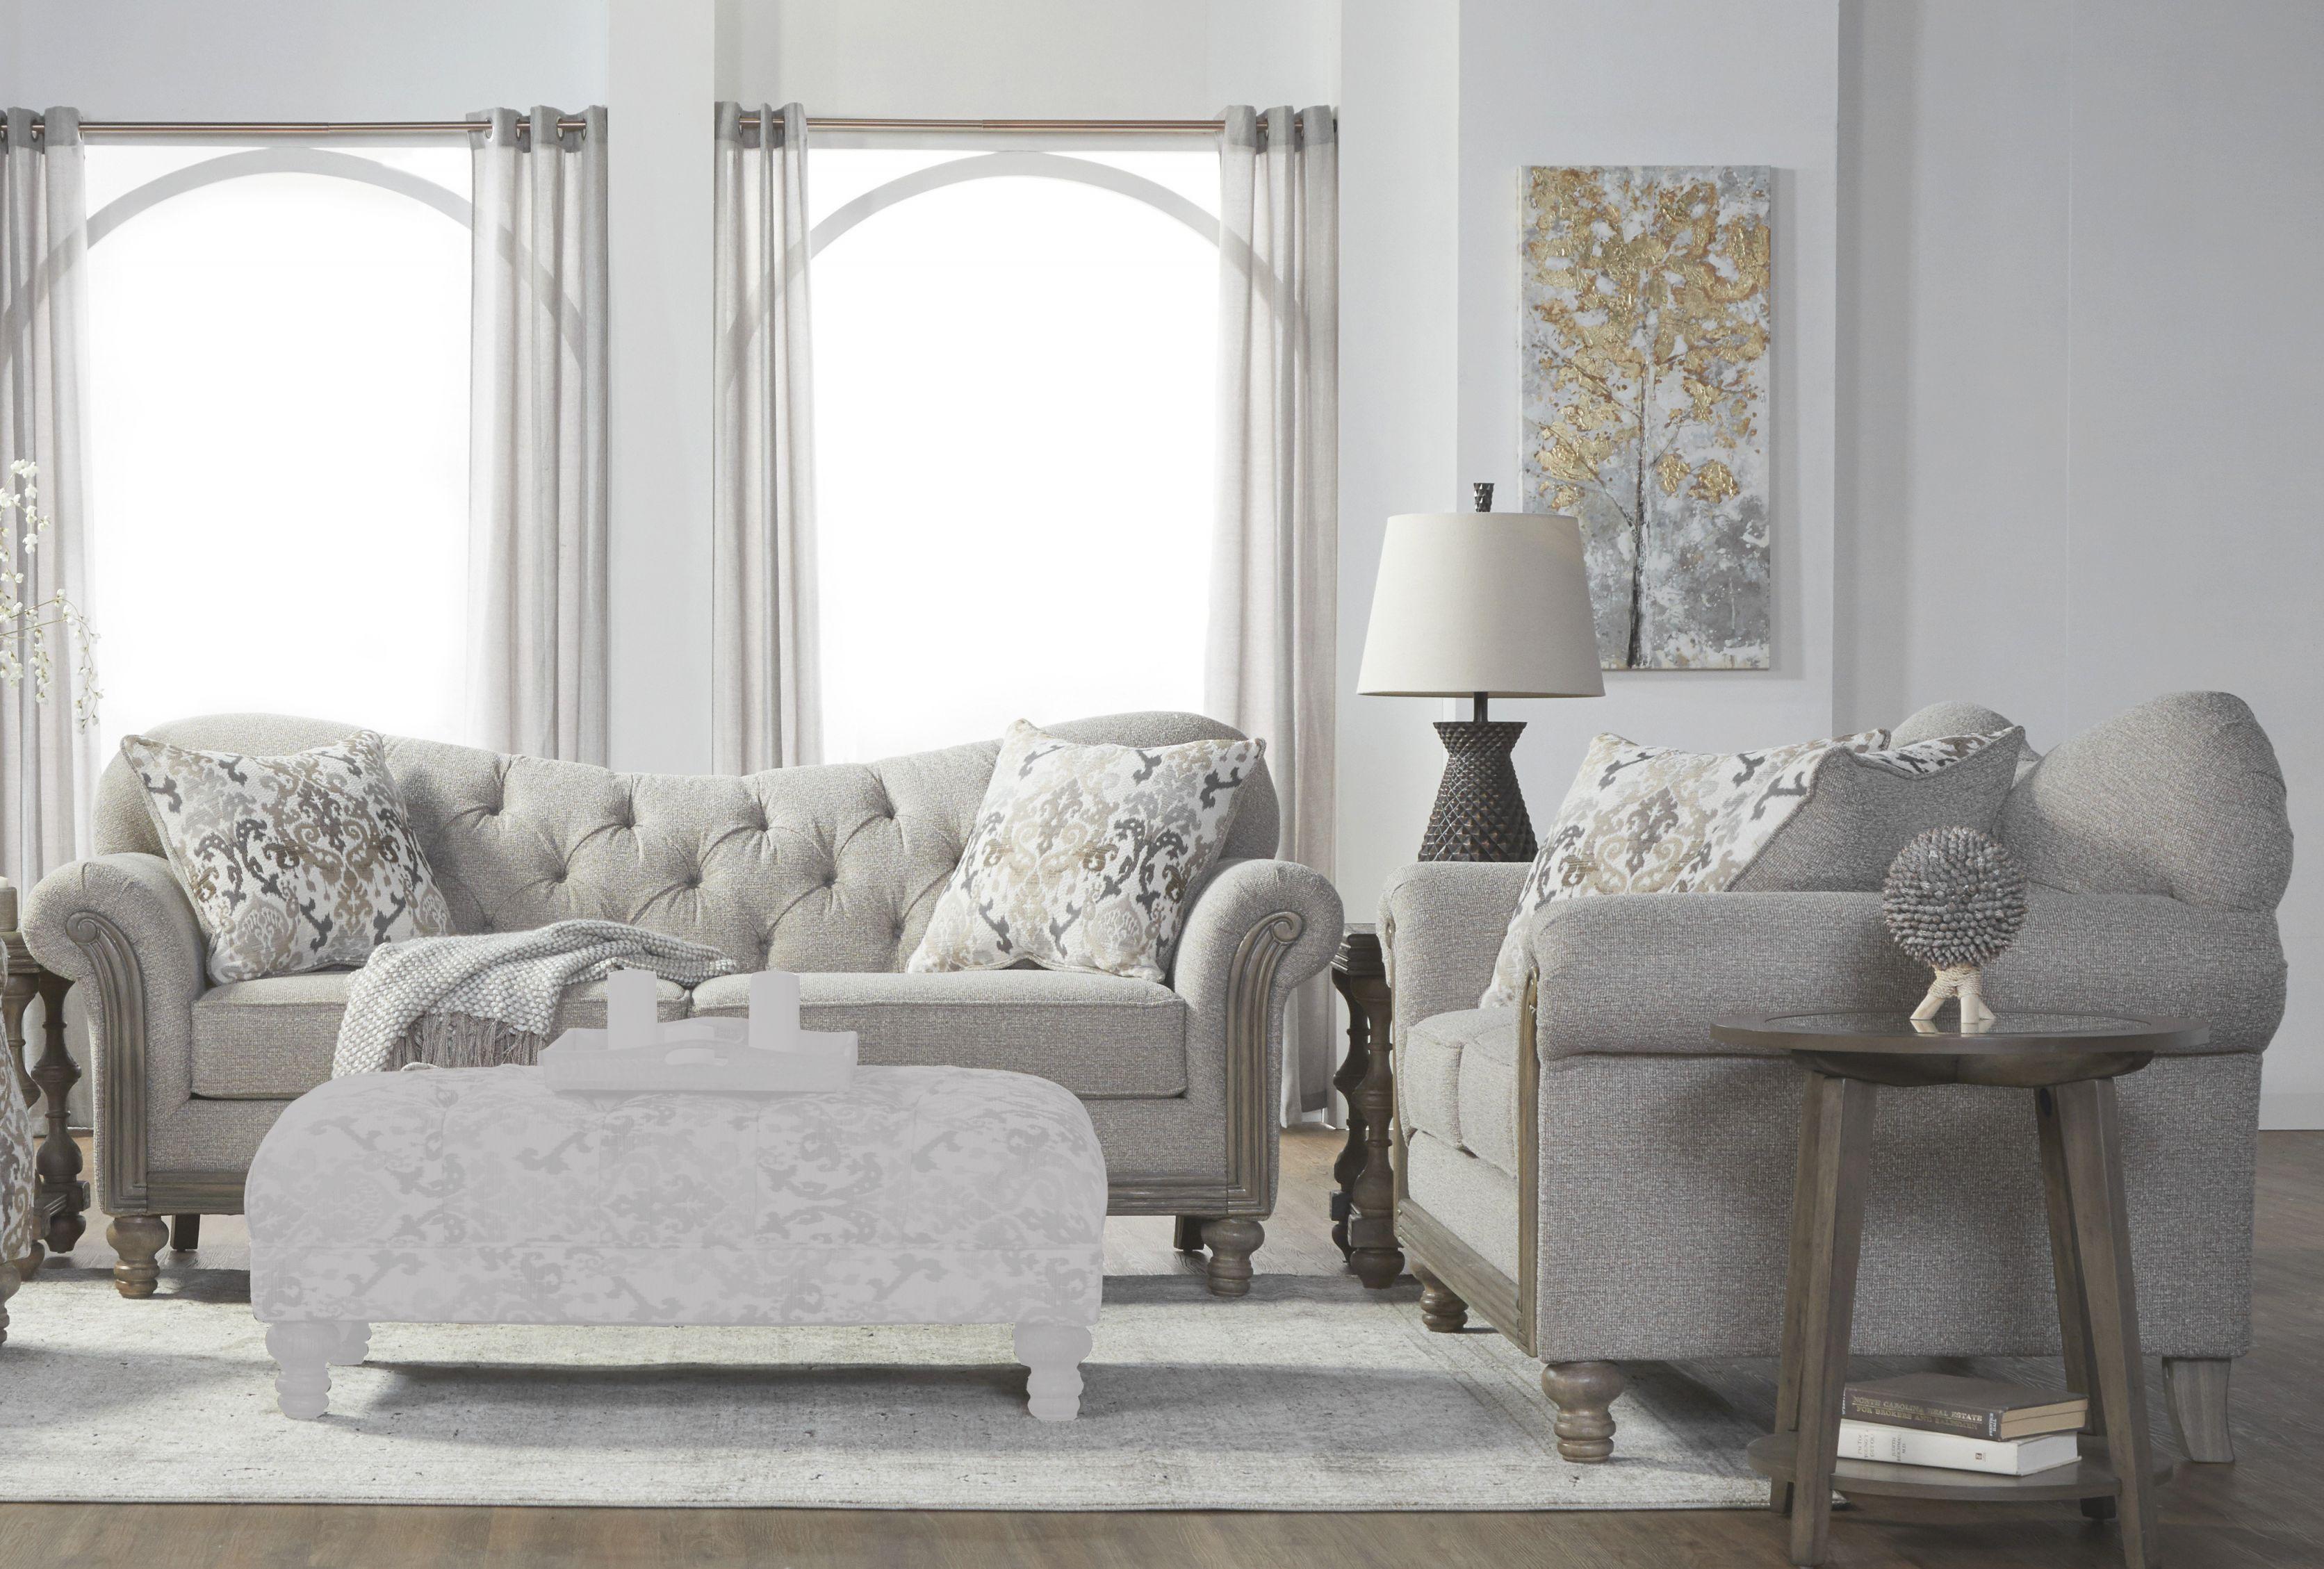 Larrick Tufted Fabric Living Room Set pertaining to Unique Tufted Living Room Furniture